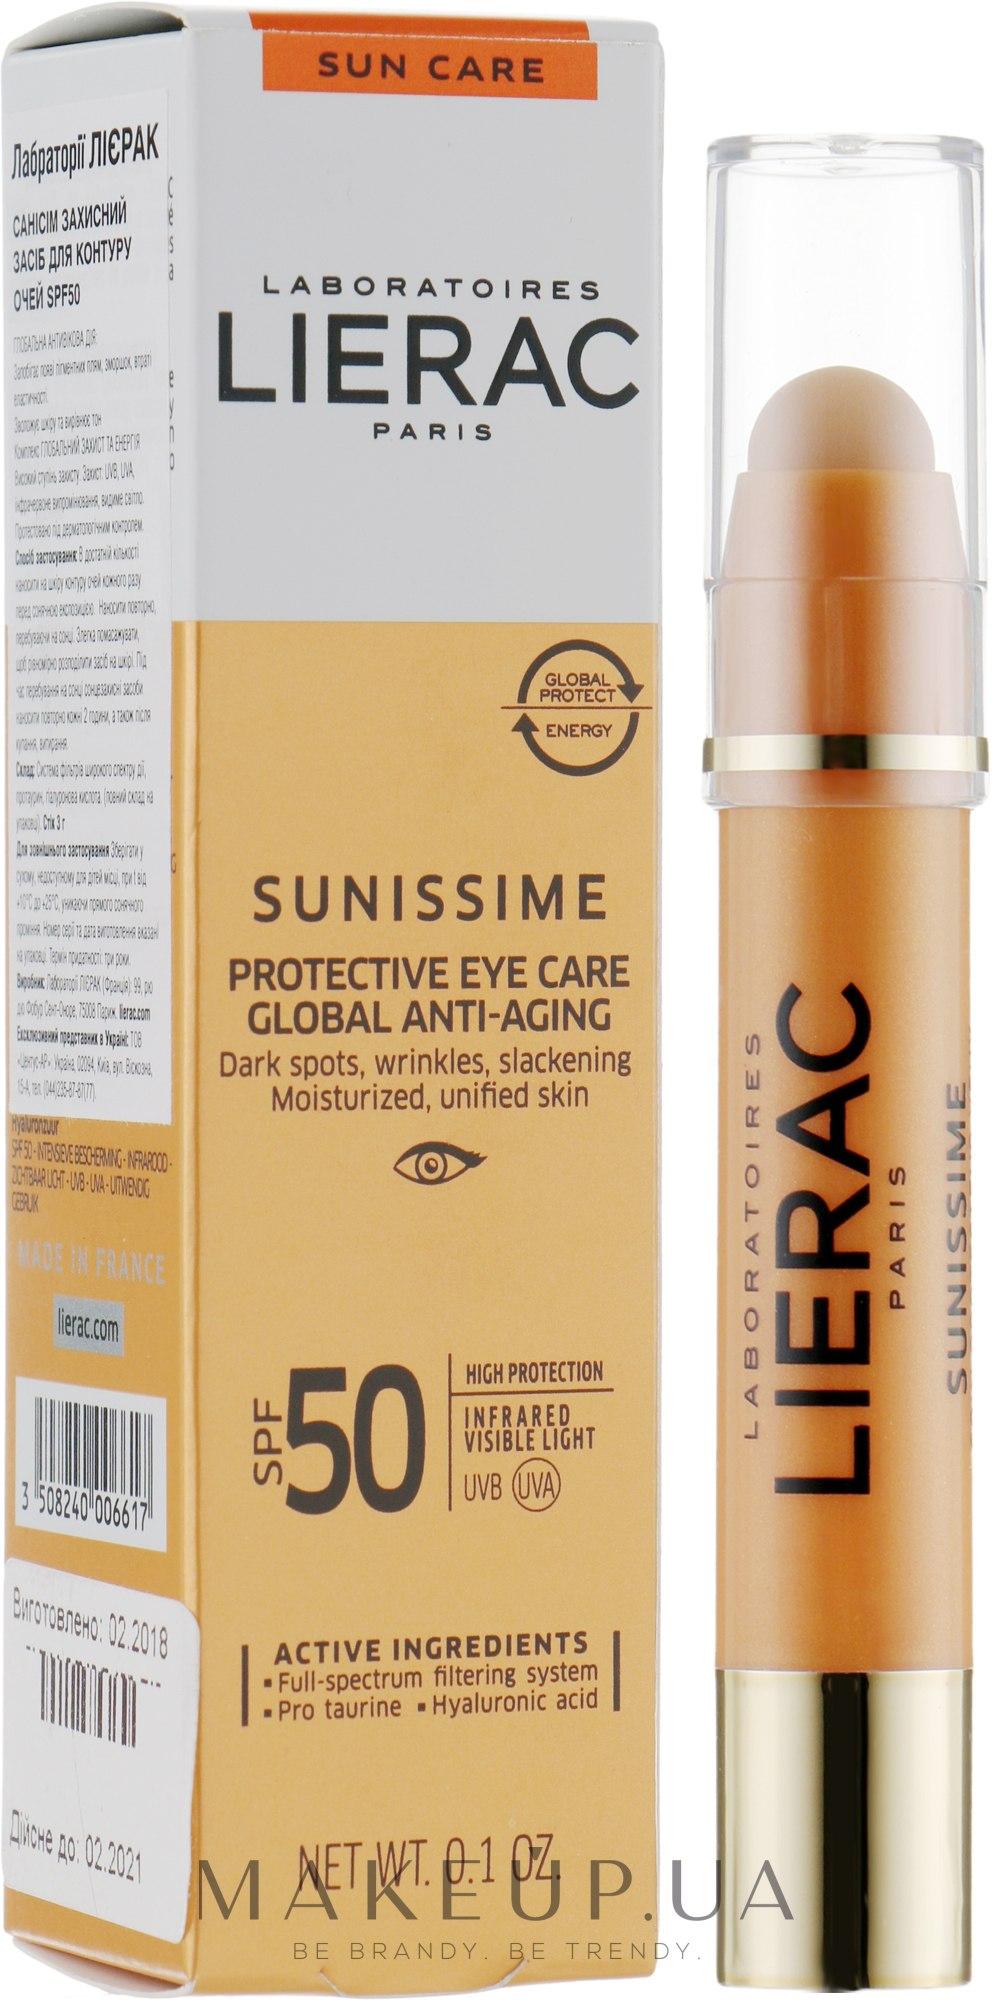 Бальзам для области вокруг глаз - Lierac Sunissime Protective Eye Care Anti-Age Global SPF50 — фото 3g